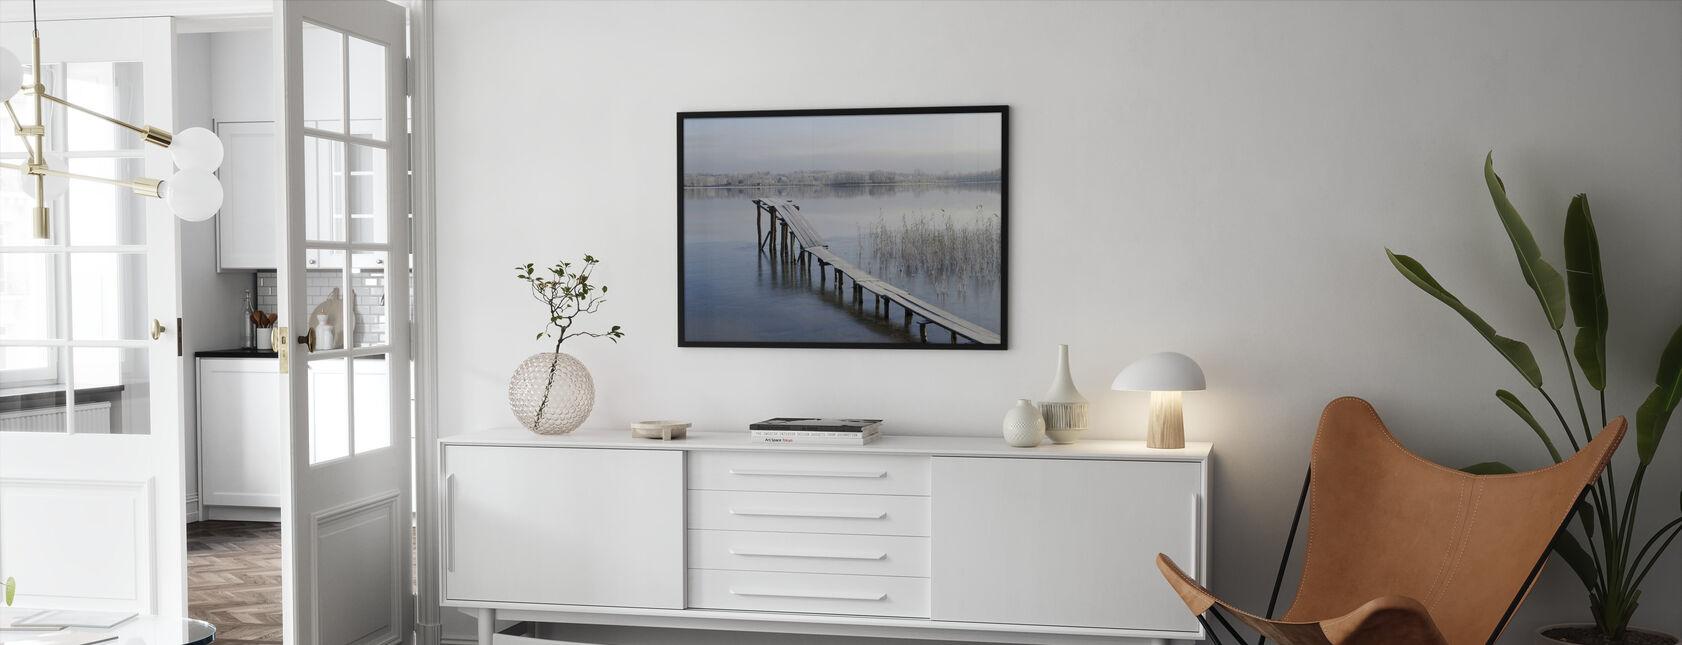 Attributes of Winter - Framed print - Living Room